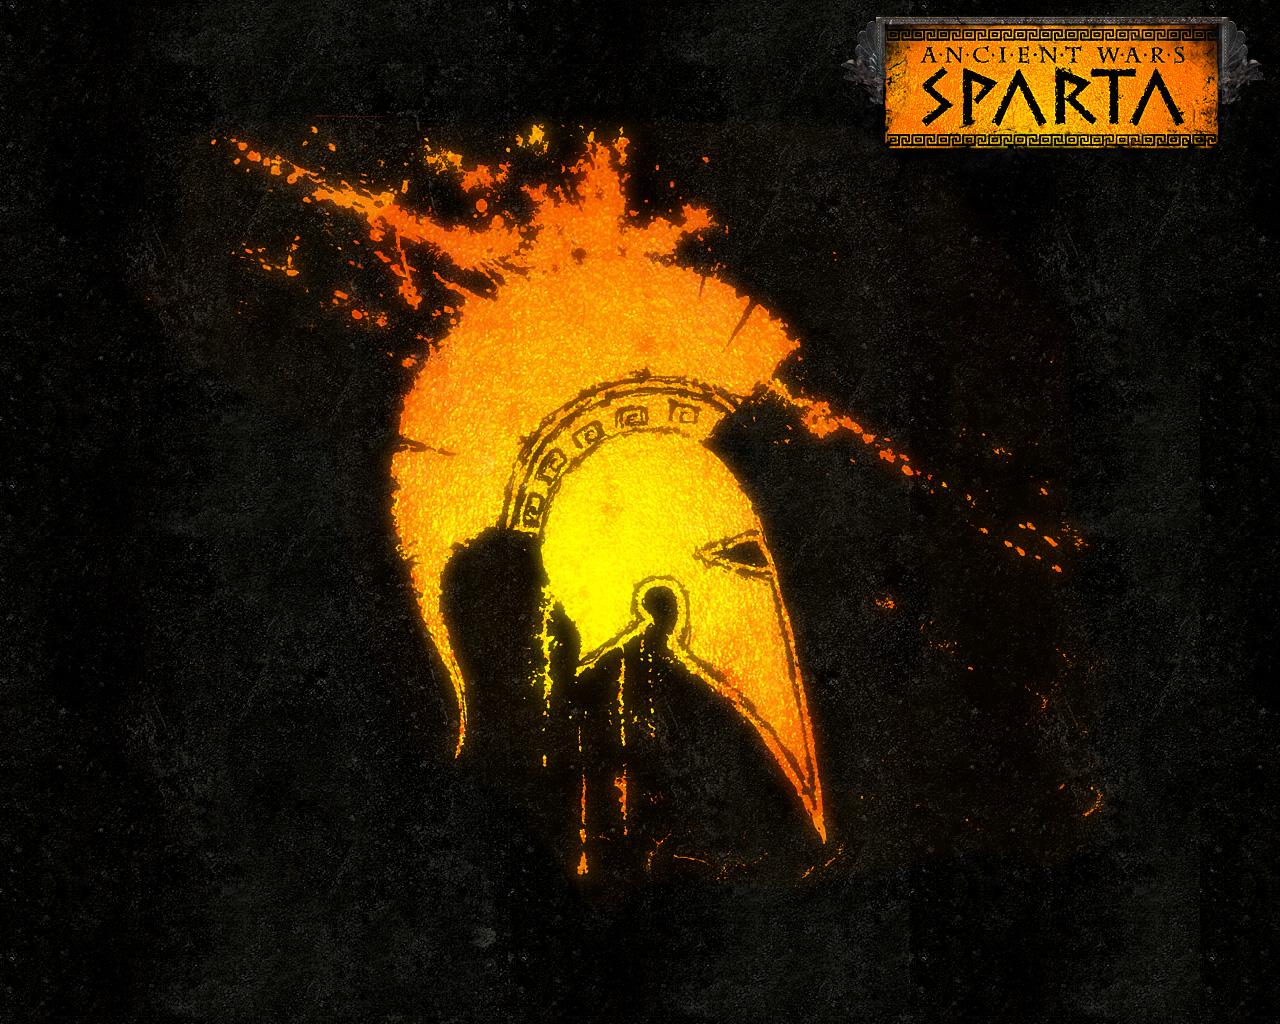 Spartan Logo Wallpaper 300 spartan he 1280x1024